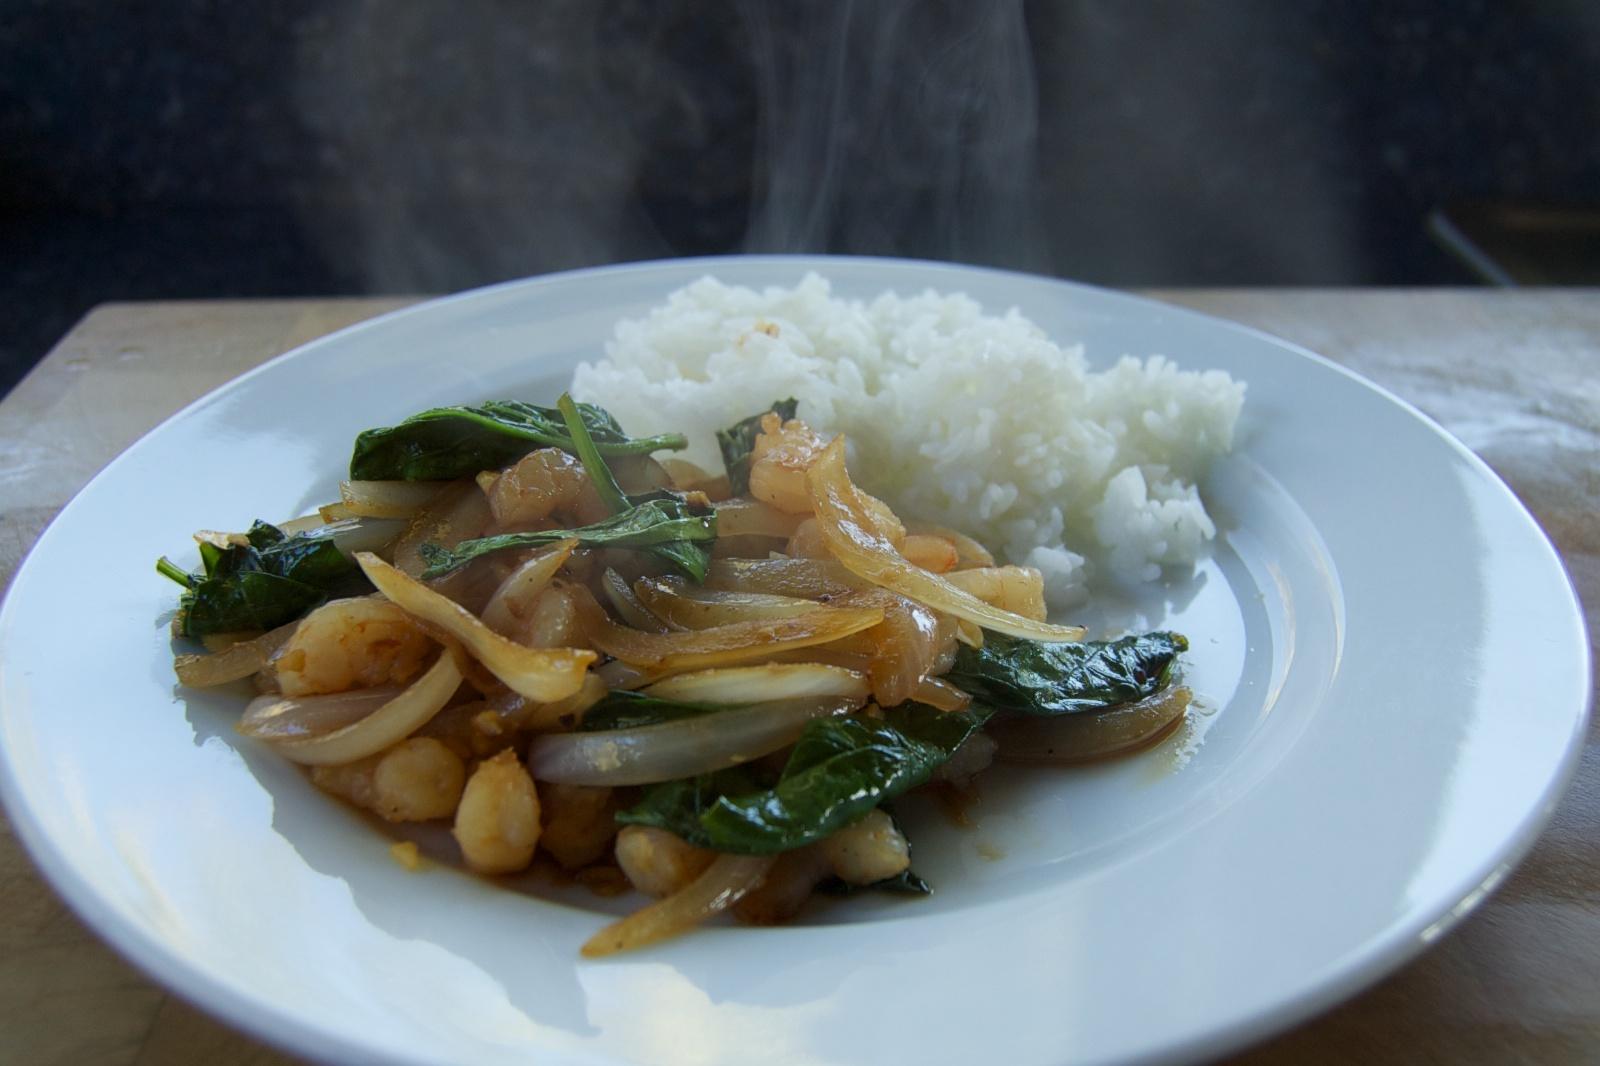 http://blog.rickk.com/food/2014/10/05/ate.2014.10.05.l.jpg